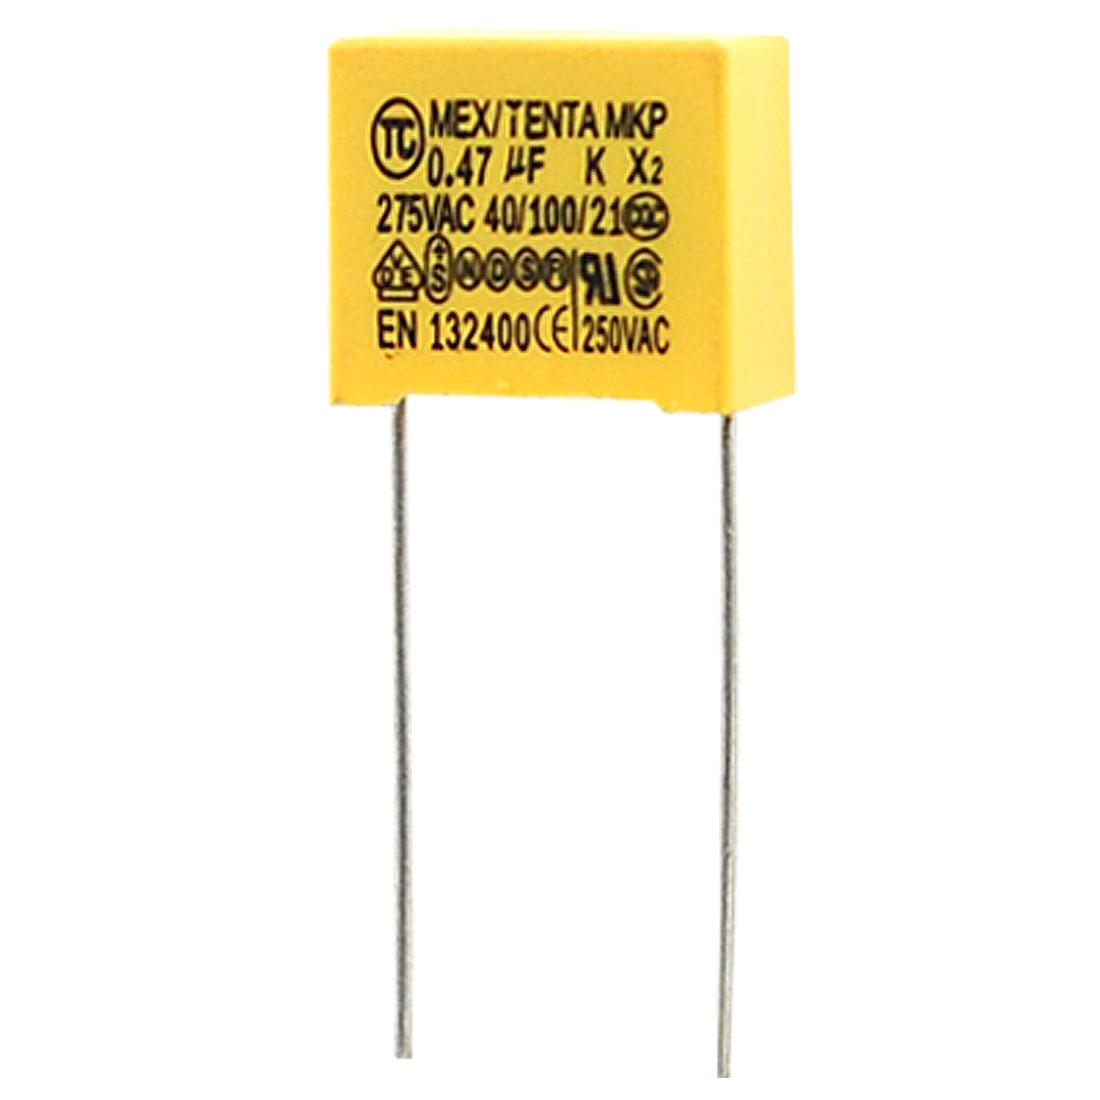 0.47uF Polypropylene Film DIP Safety Capacitors 10 Pcs